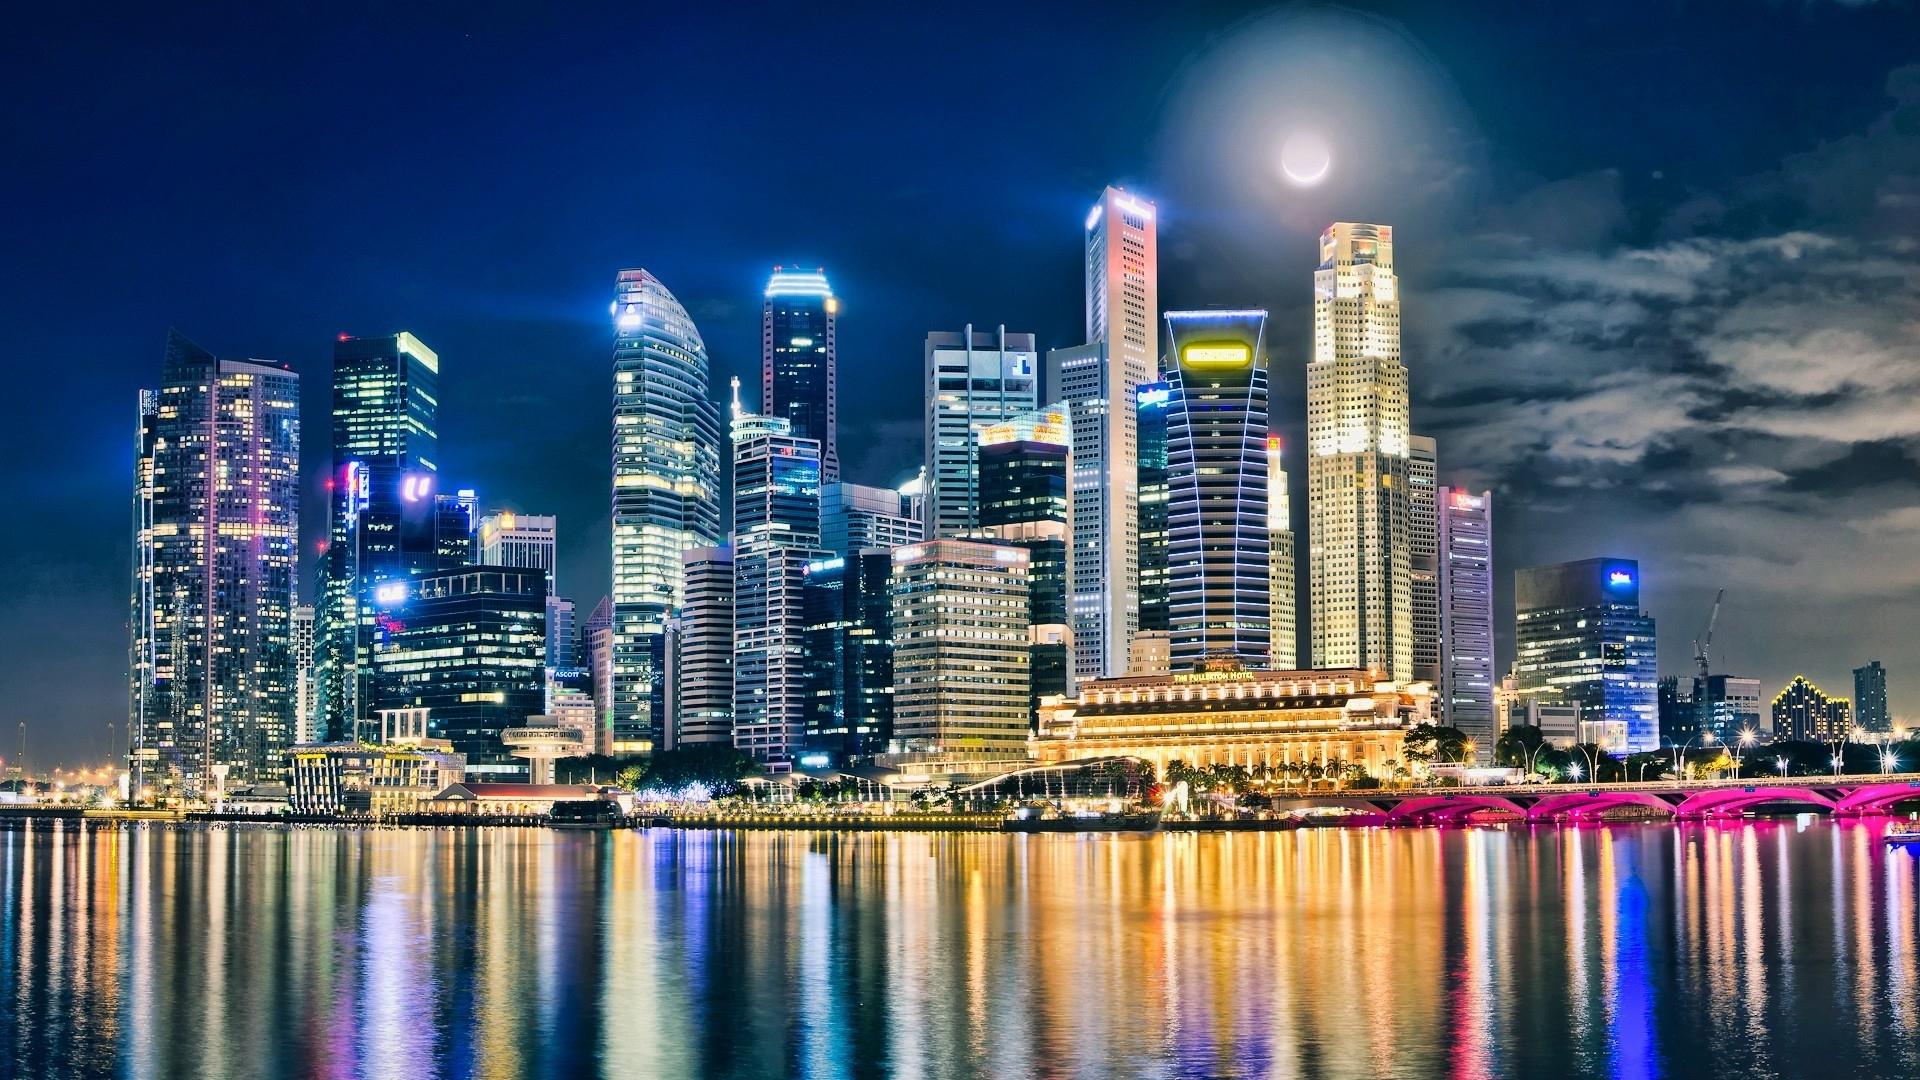 Fantastic Hdr City Wallpaper - Panama City Night Hd , HD Wallpaper & Backgrounds